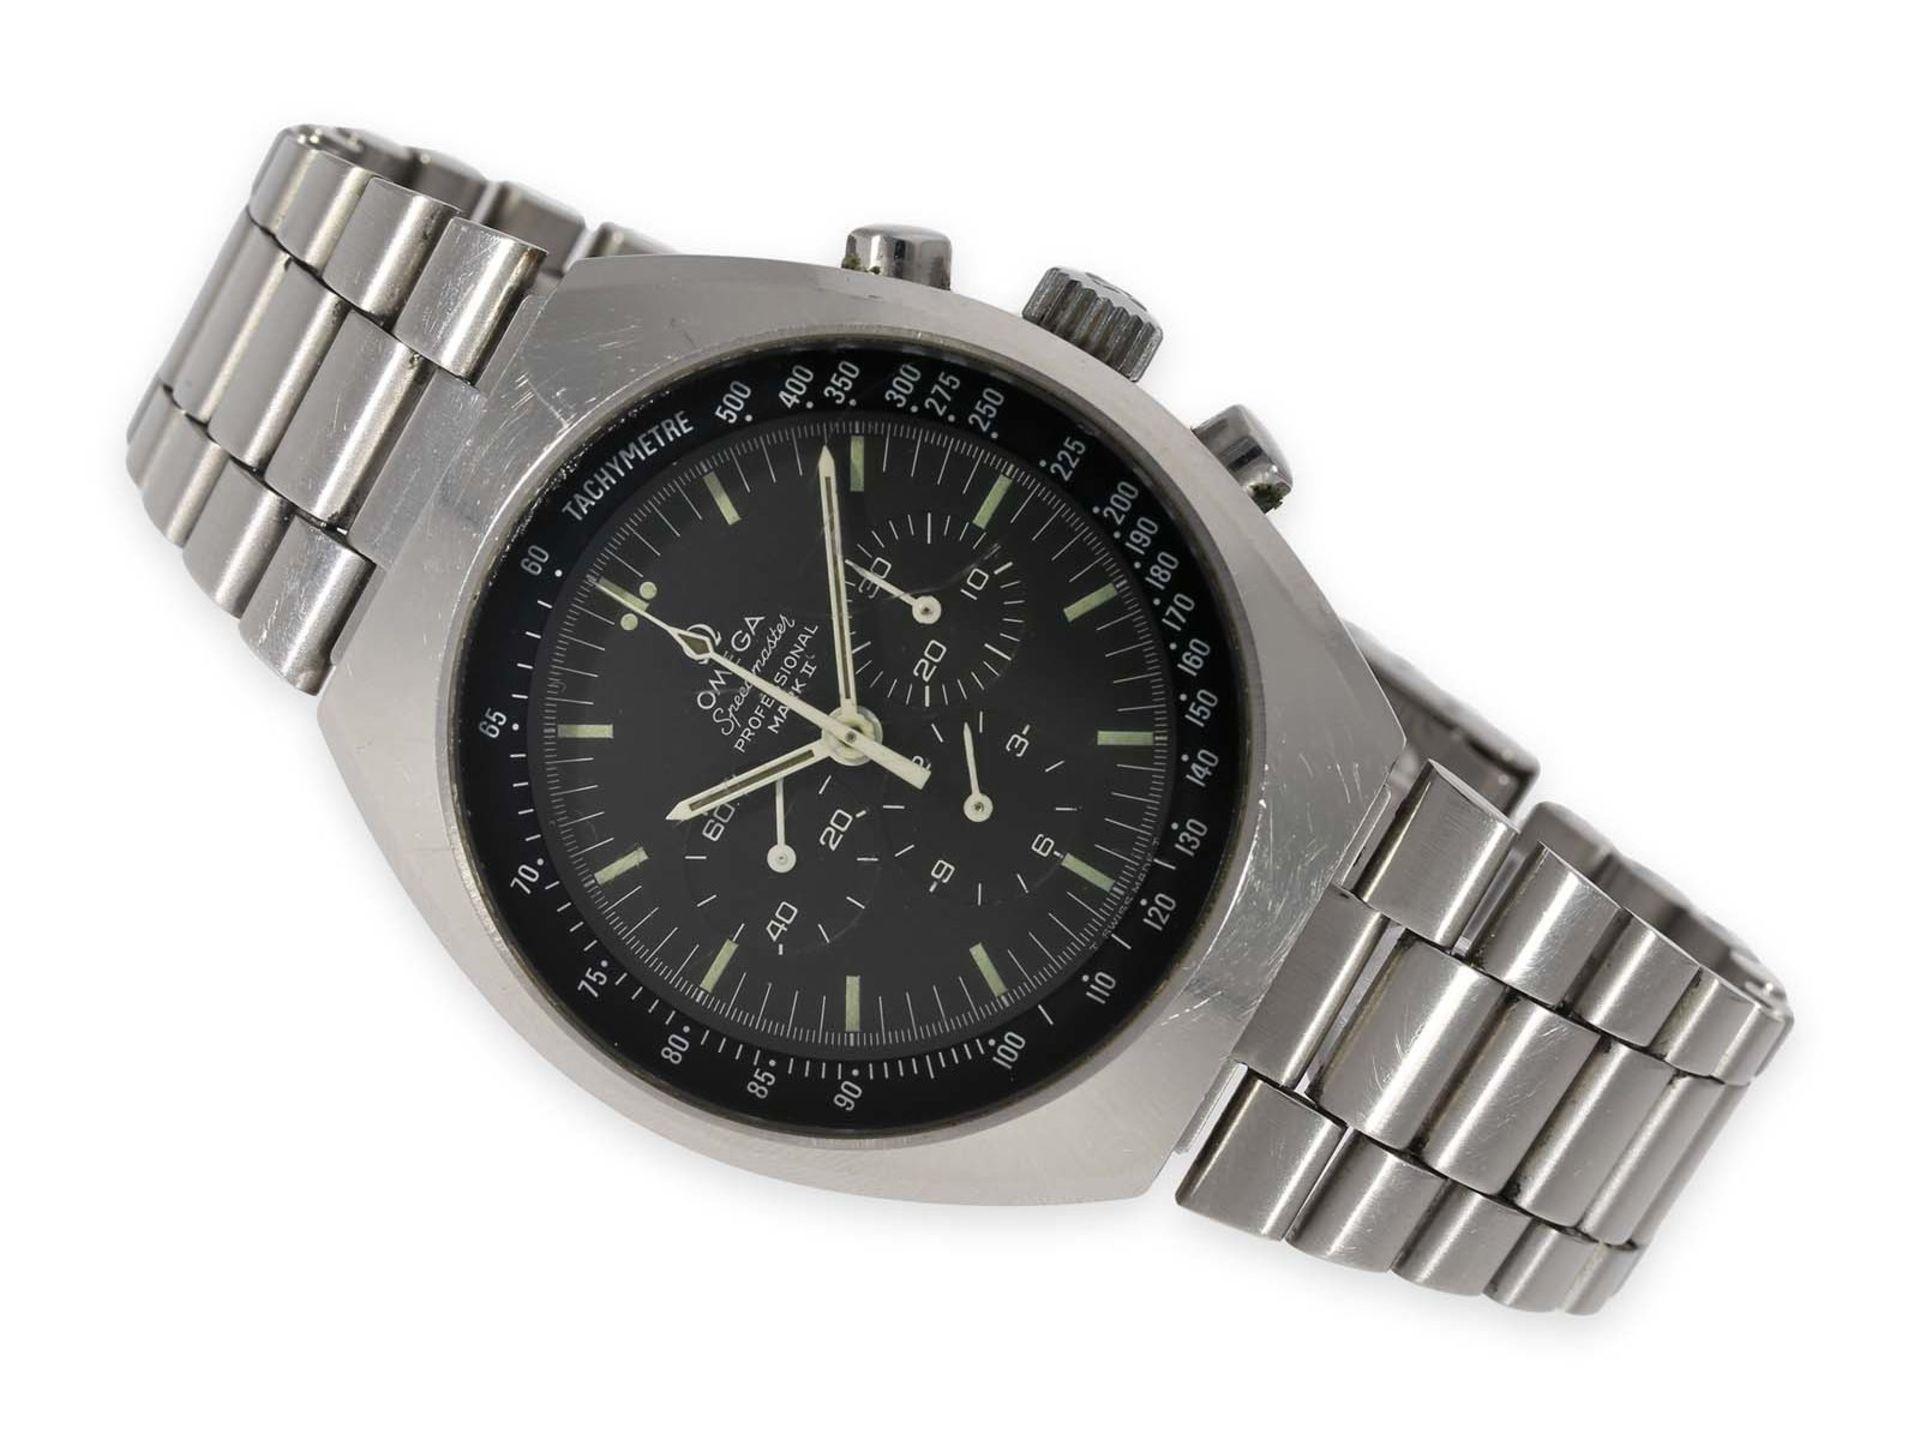 "Wristwatch: vintage Omega Speedmaster Chronograph ""Mark II"", reference 145.014, ca. 1970"